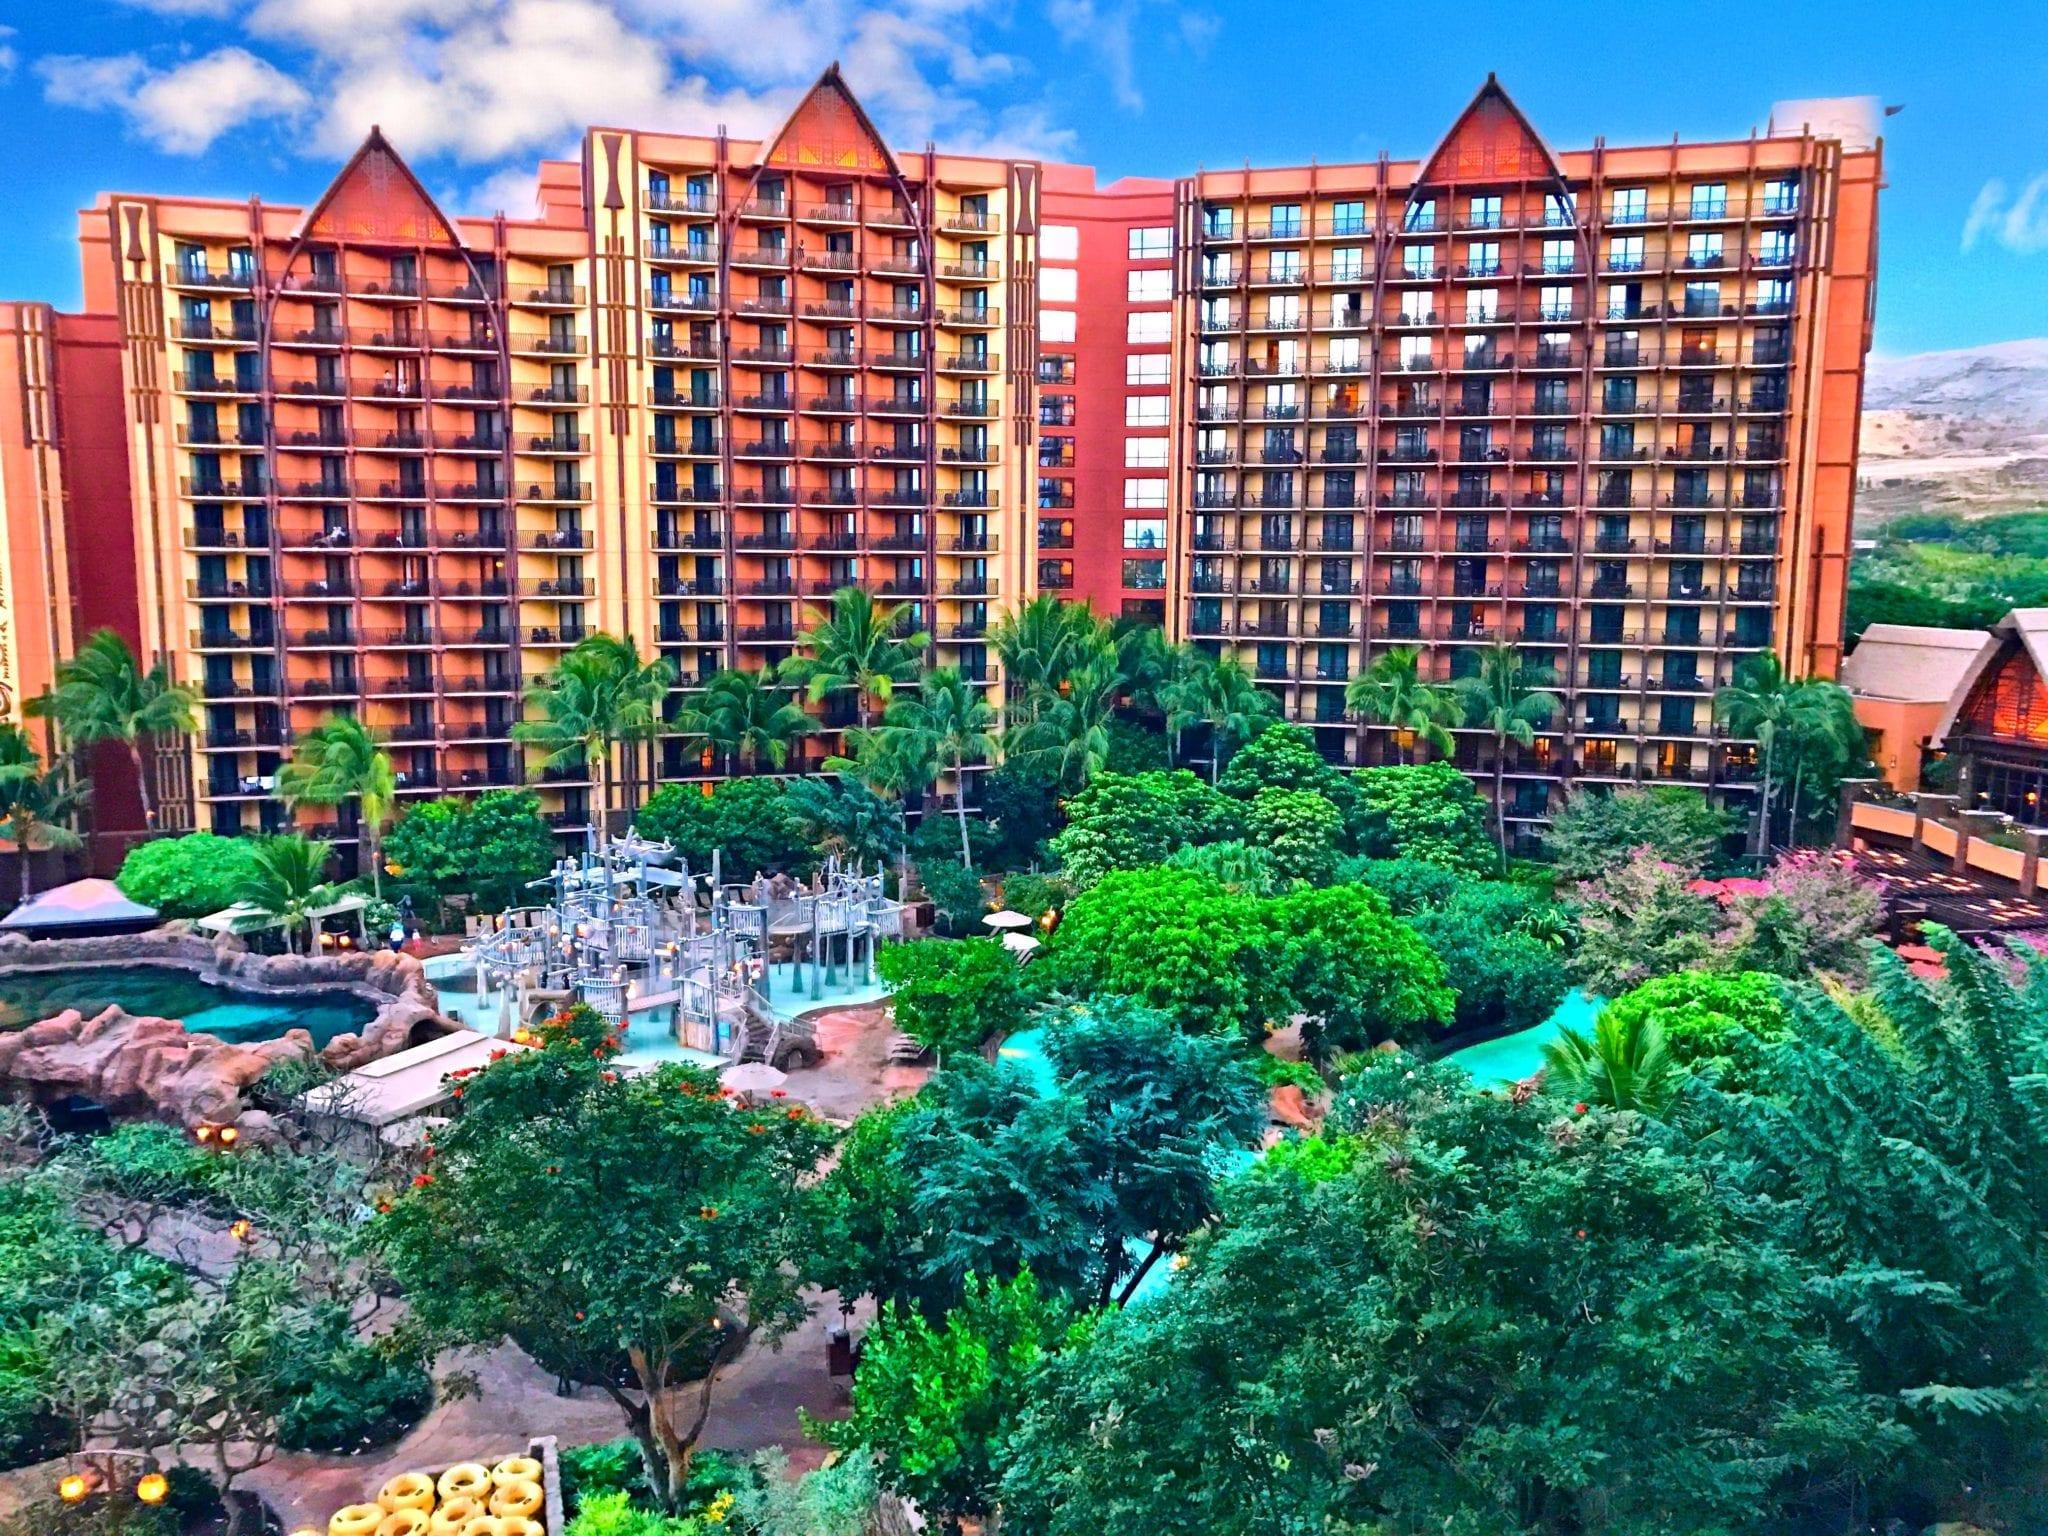 Top 5 Things To Do At Aulani, A Disney Resort & Spa